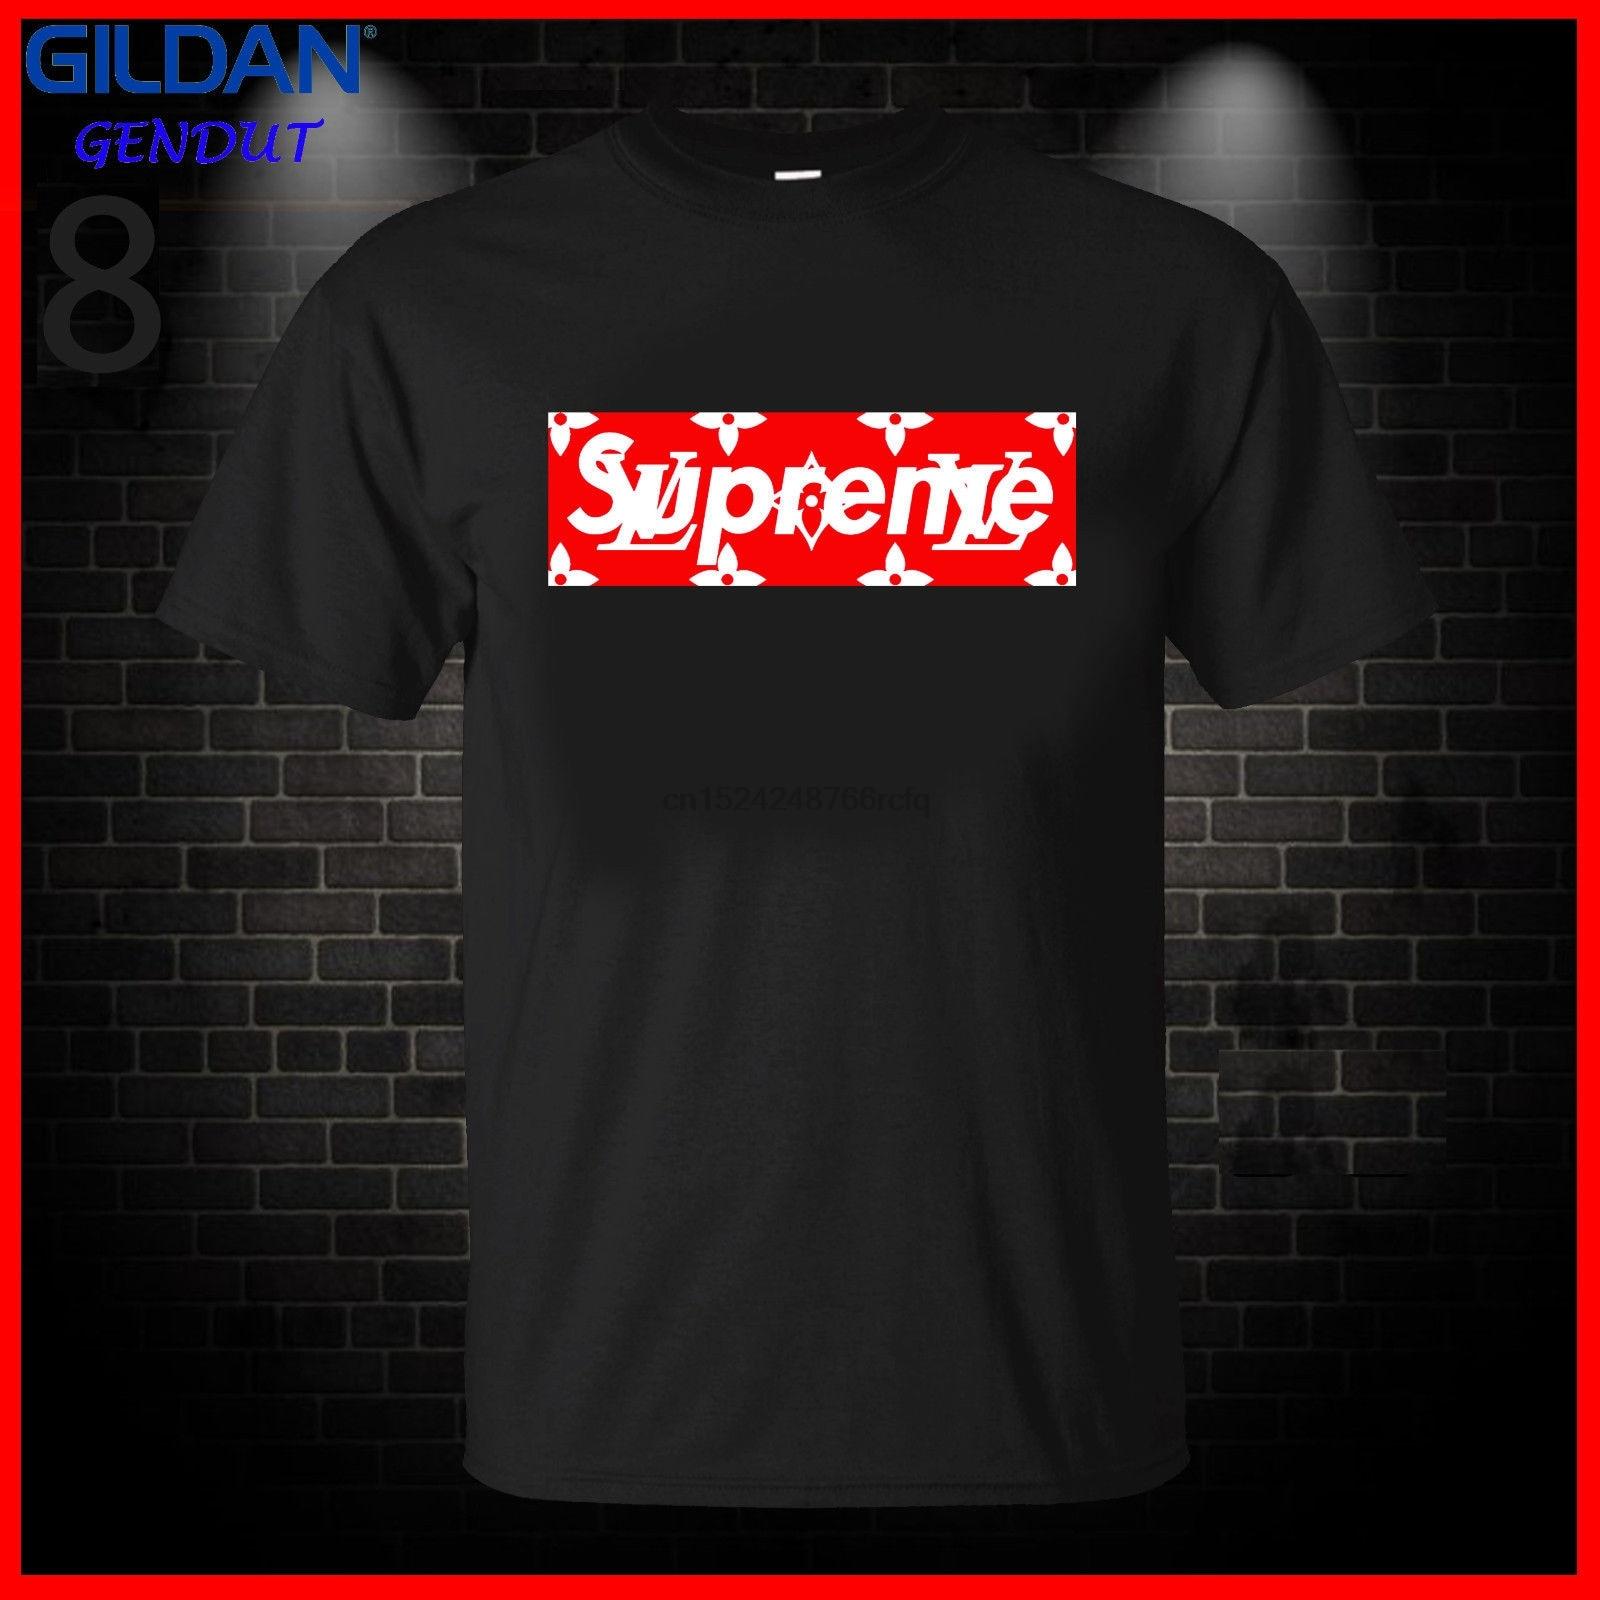 New SPR Monogram Collaboration Graphic Print Short Sleeve T-shirt Tee Street b55b9519686c